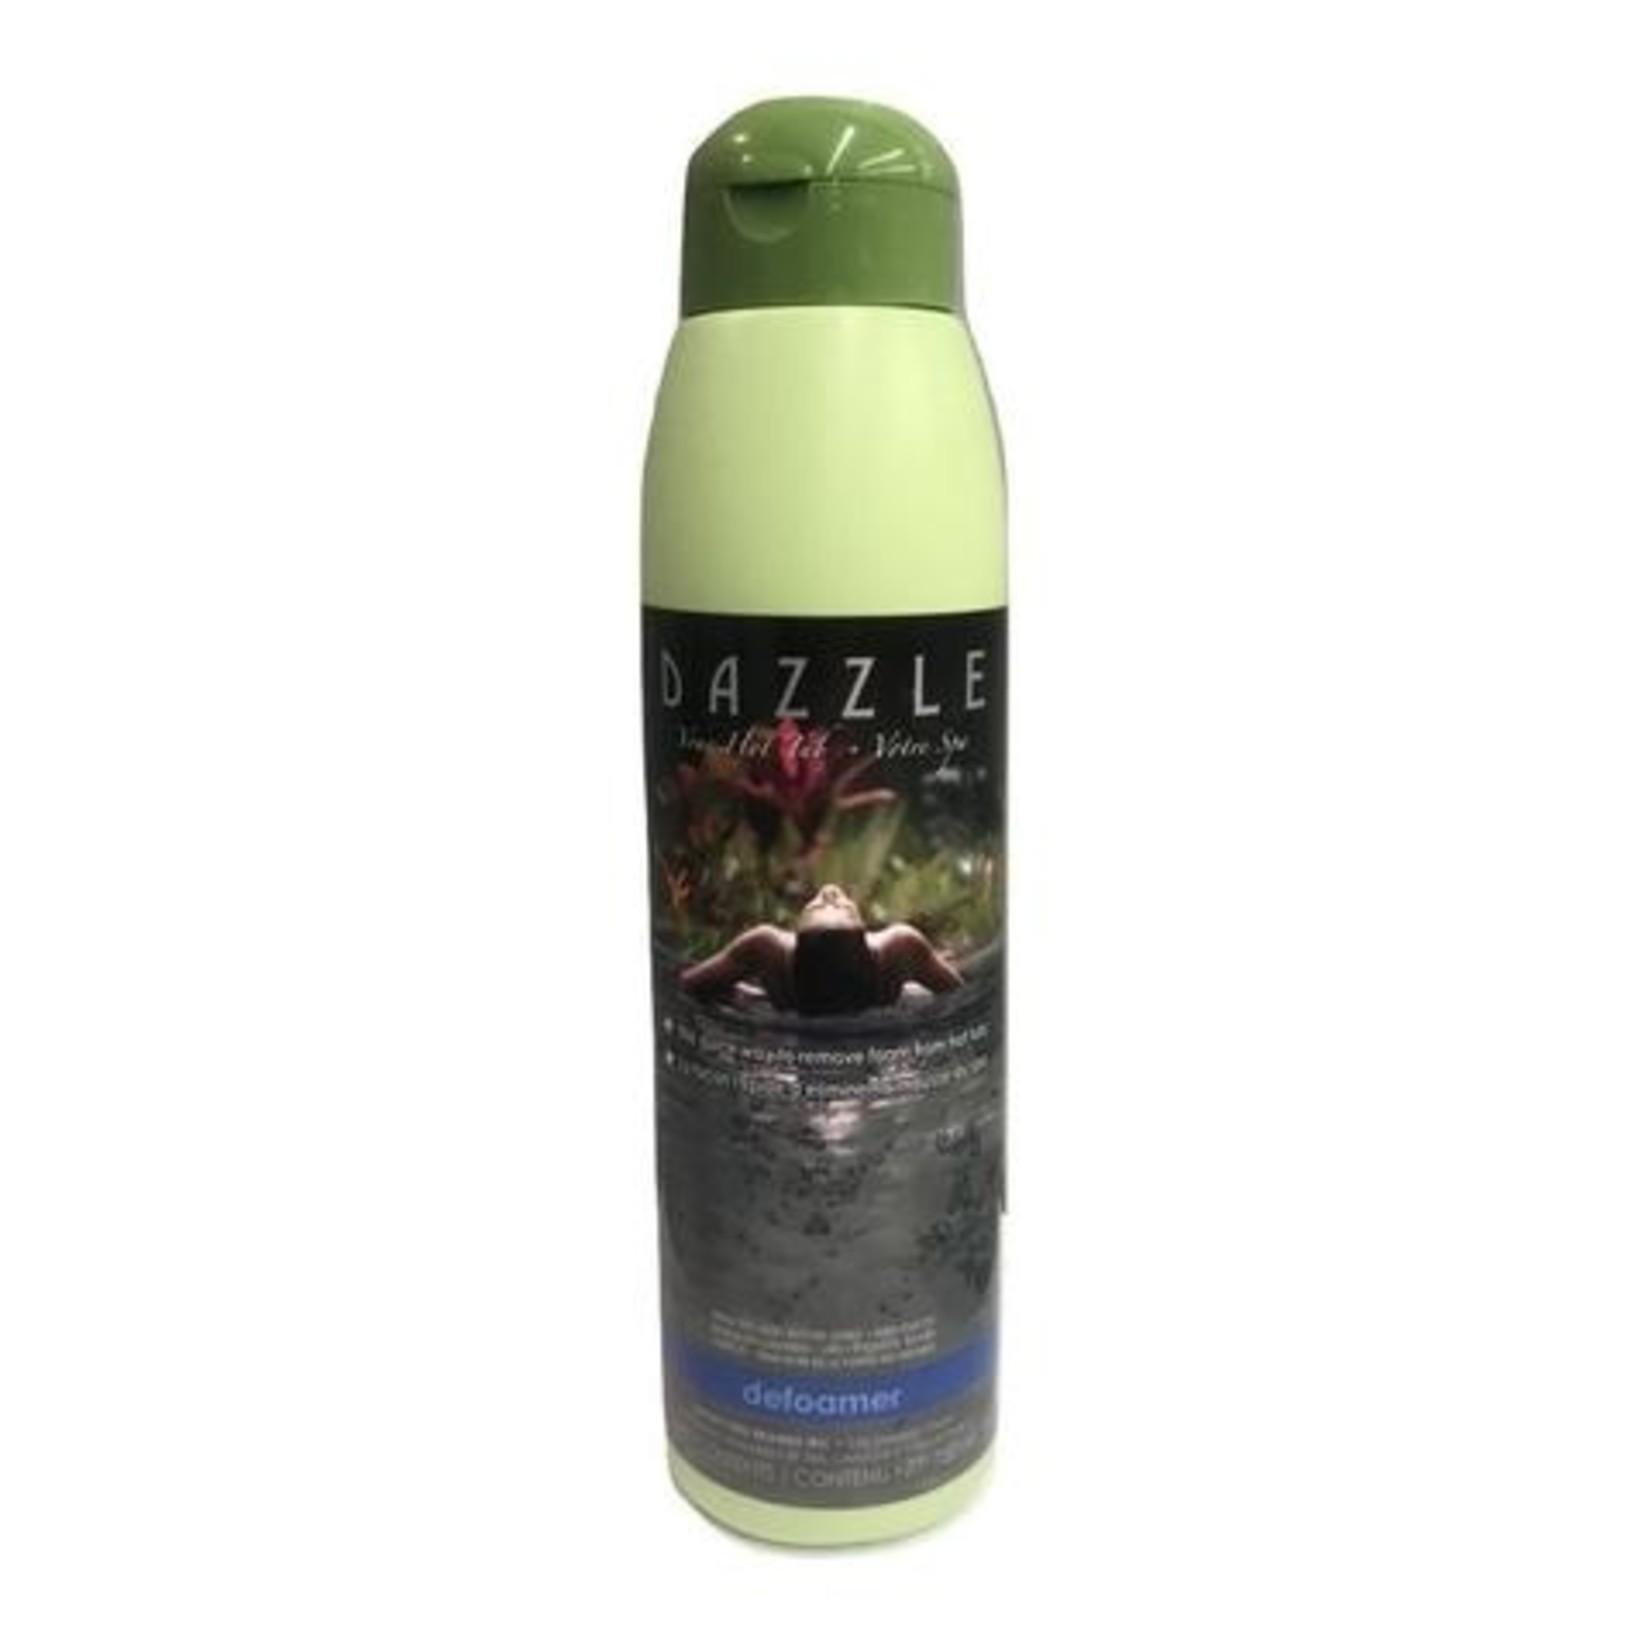 Dazzle Defoamer (750 mL)